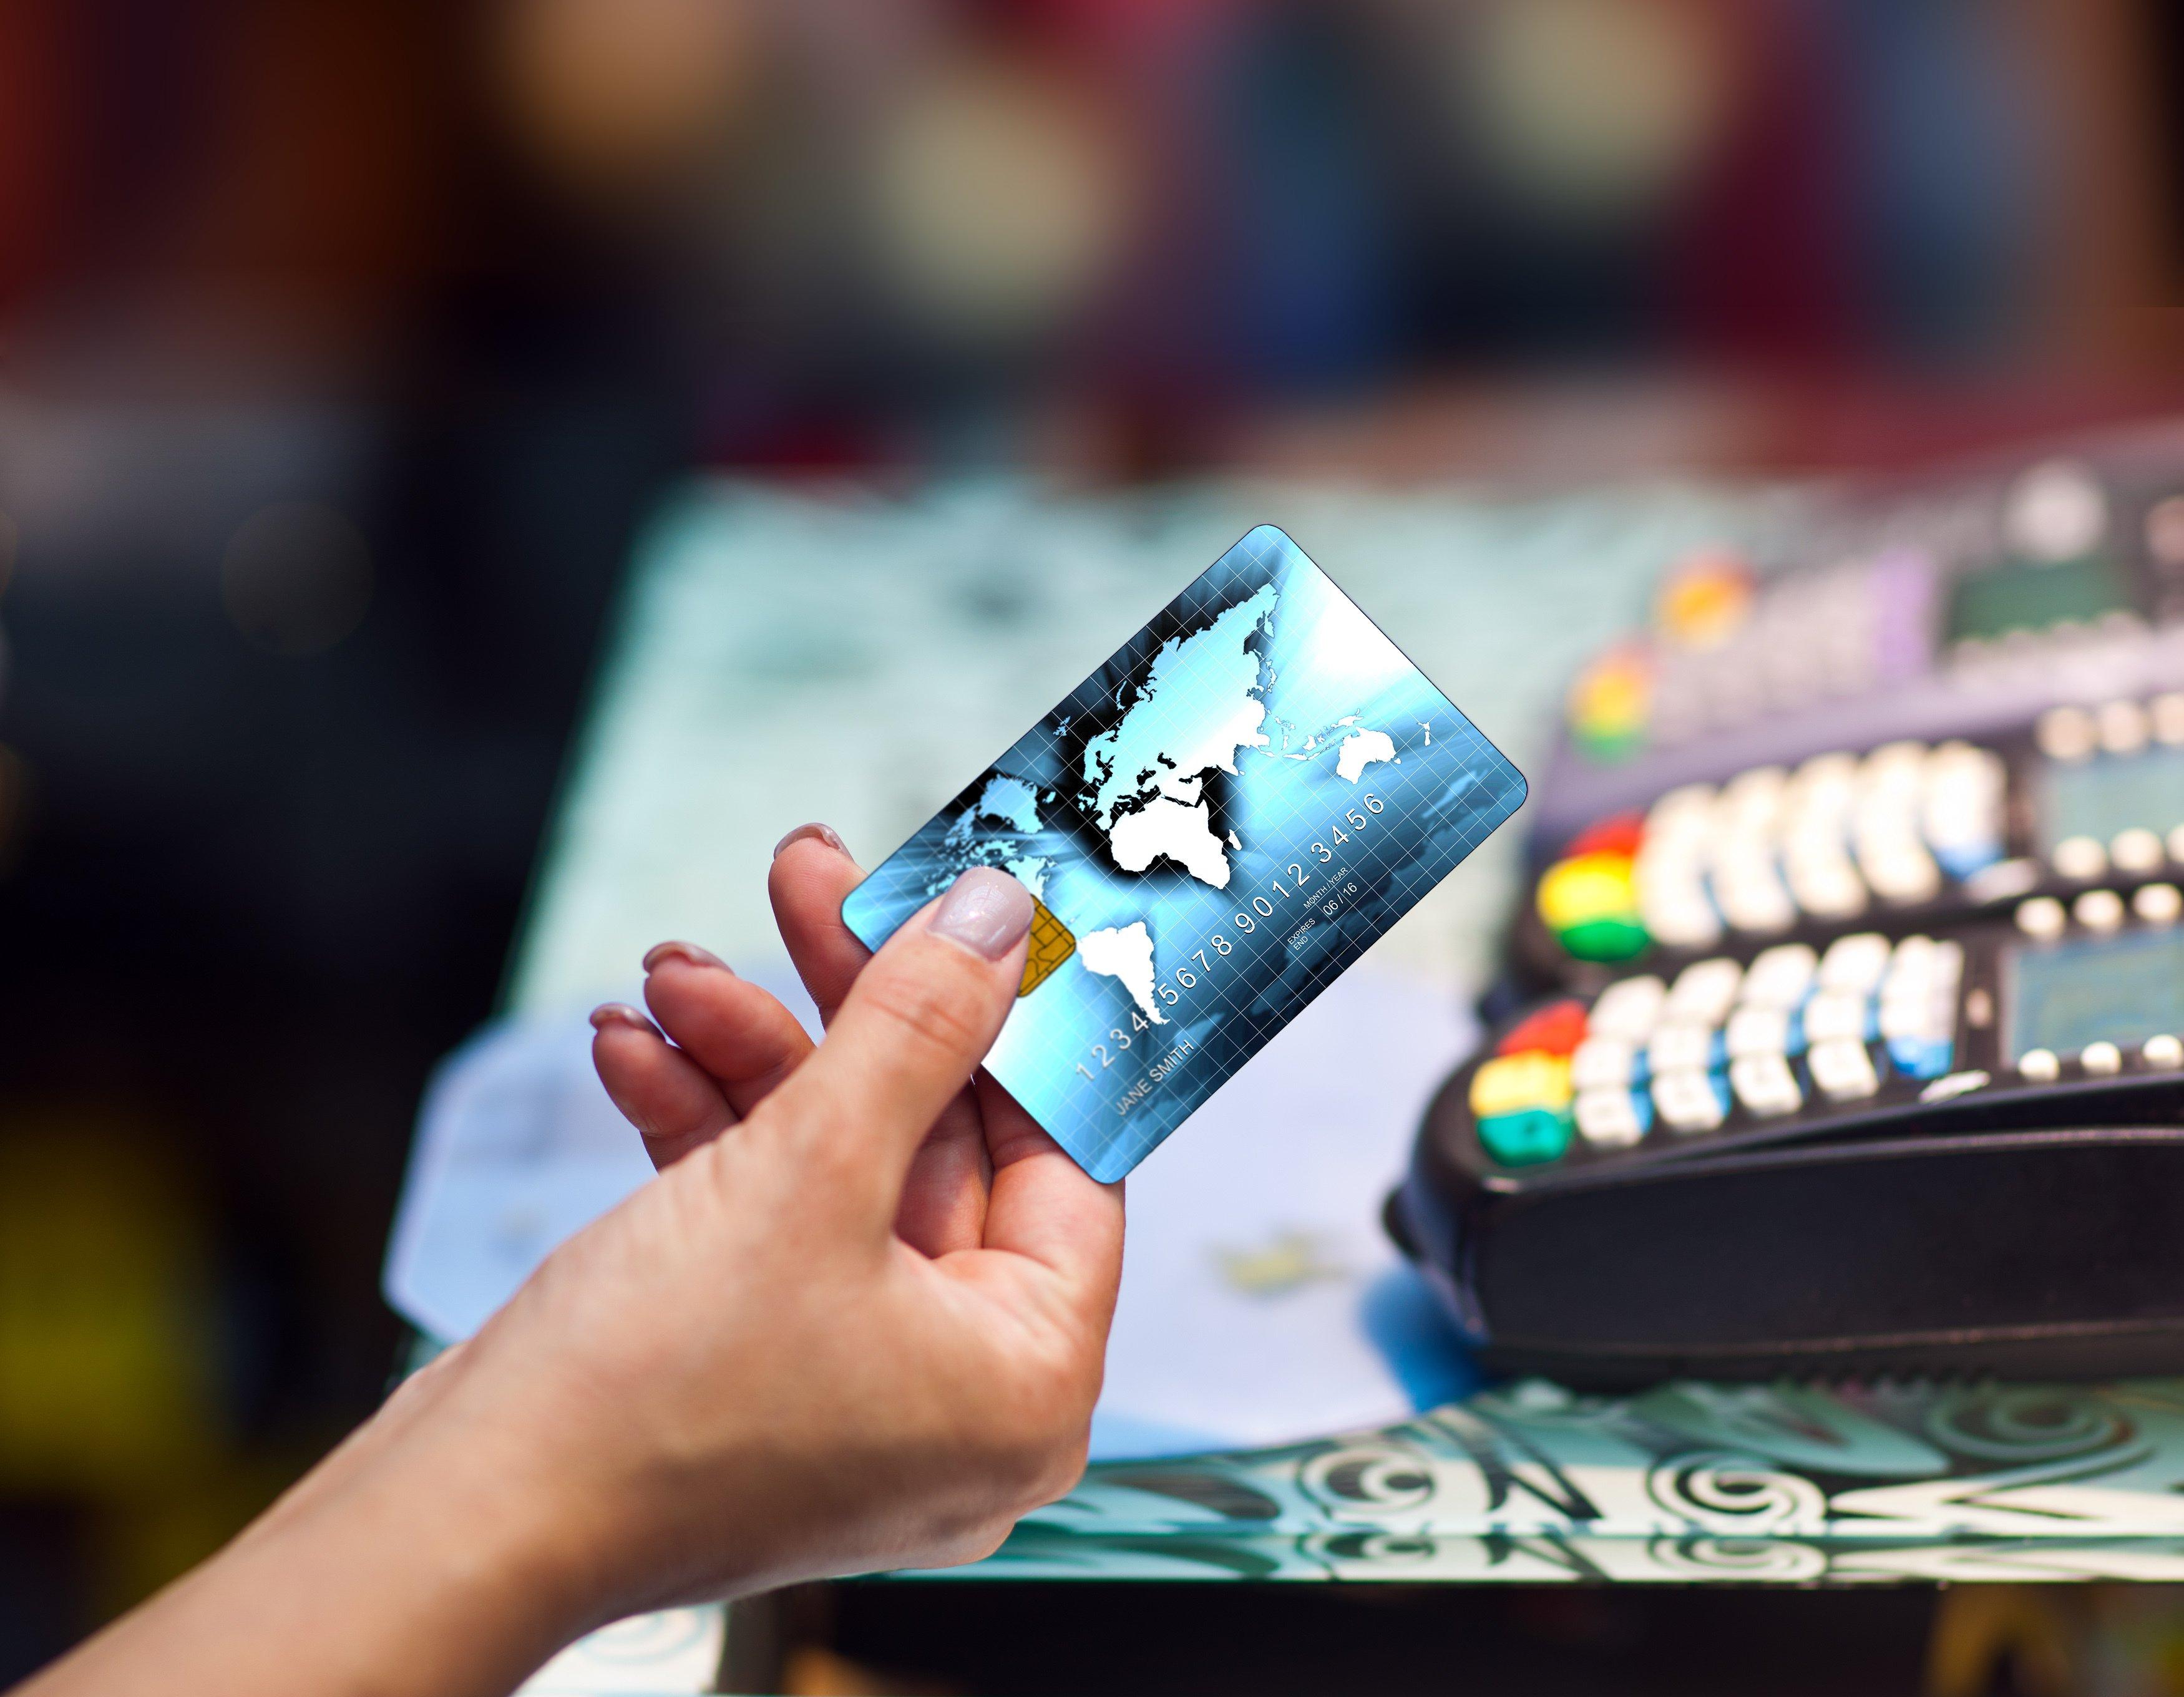 meios de pagamento, empresas do setor meios de pagamento, empresas do segmento meios de pagamento, setor meios de pagamento, segmento meios de pagamento, economia, macroeconomia